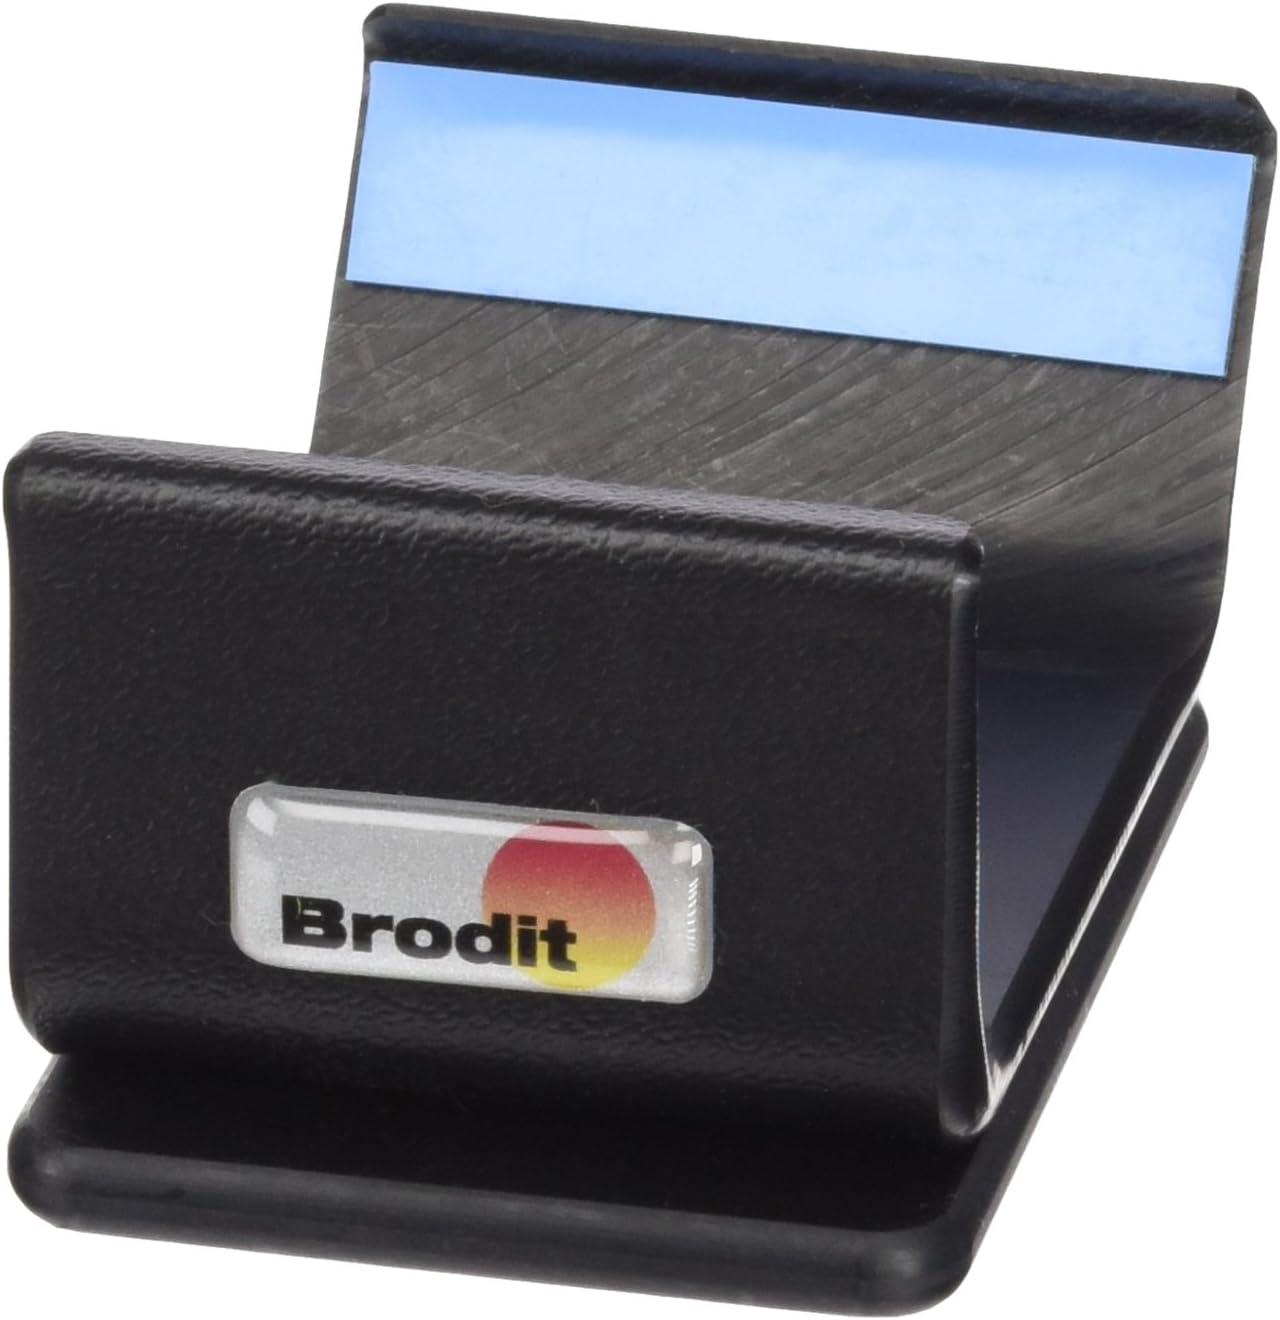 Brodit 7320286551144 Support de Montage